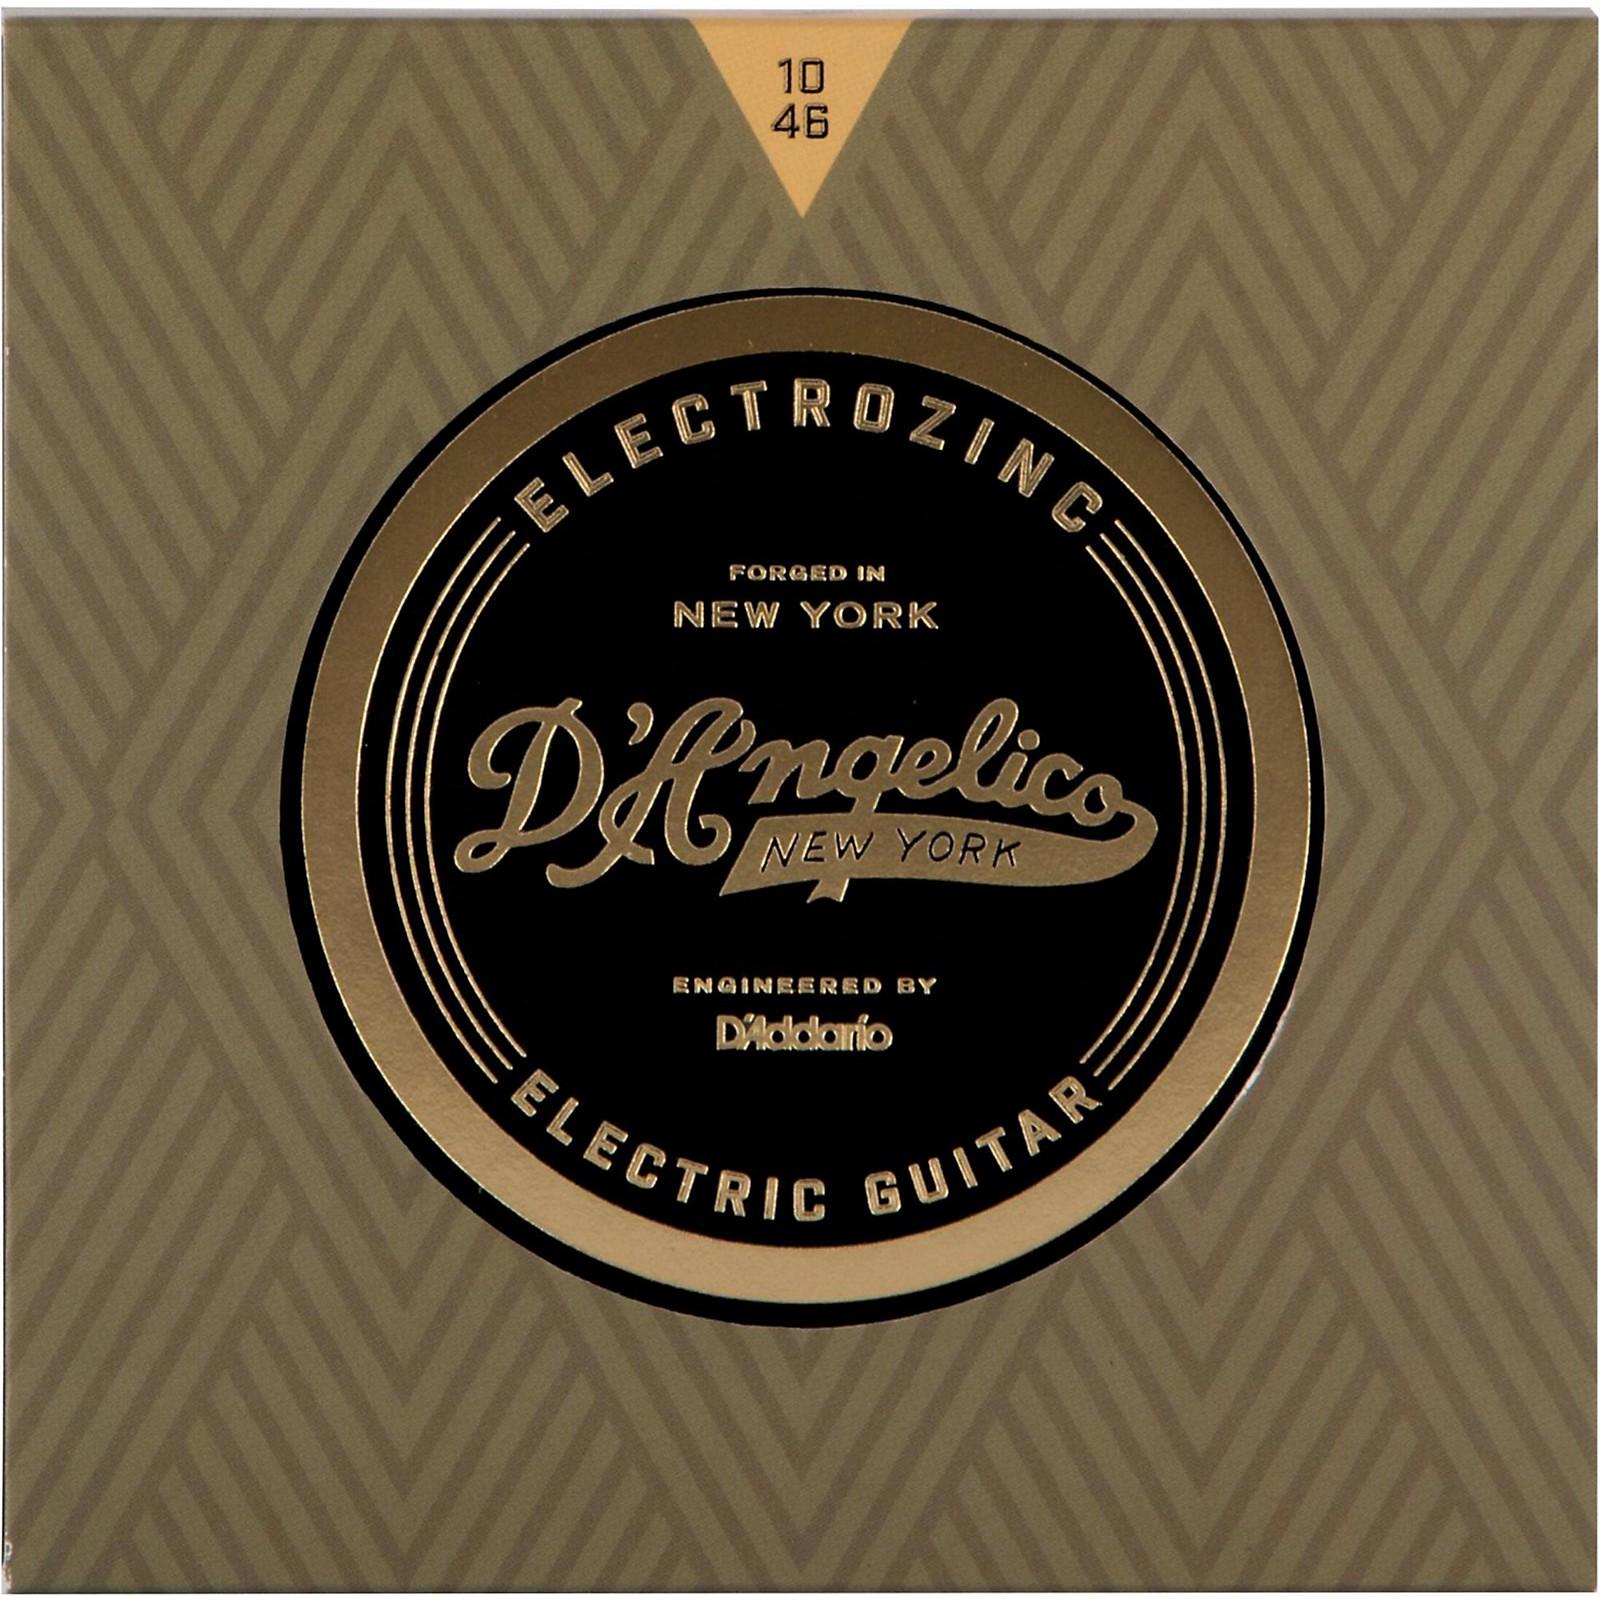 D'Angelico Electrozinc Rock 10-46 Light Electric Guitar Strings